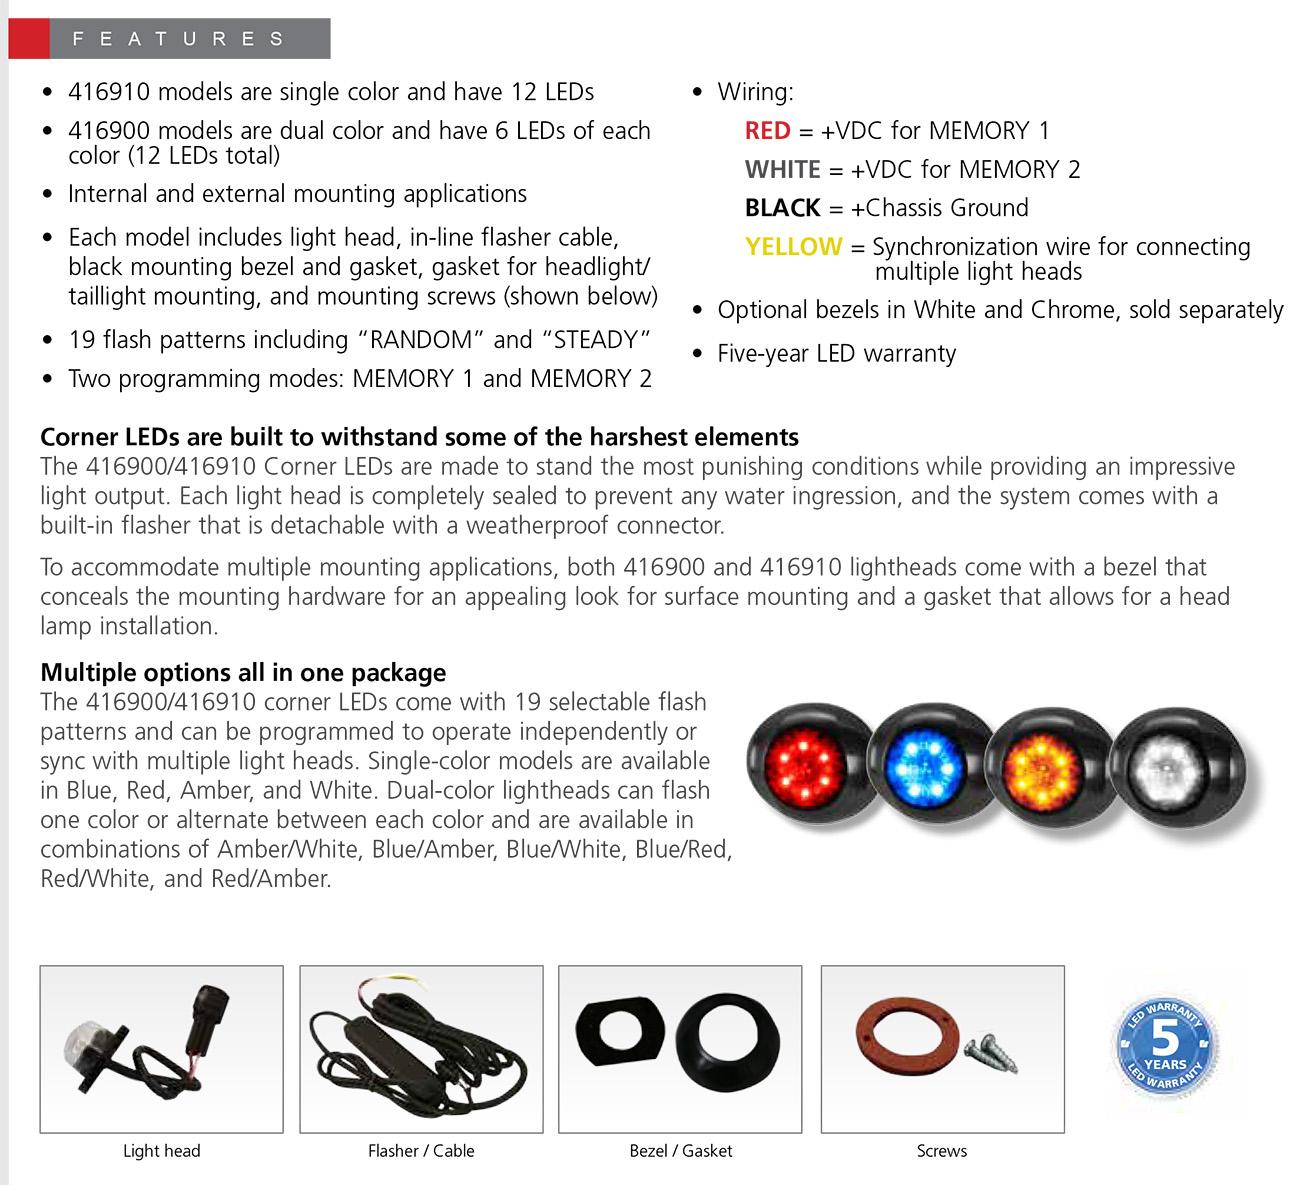 m4009-416900-416910-dual-colored-corner-leds-lr-1.jpg